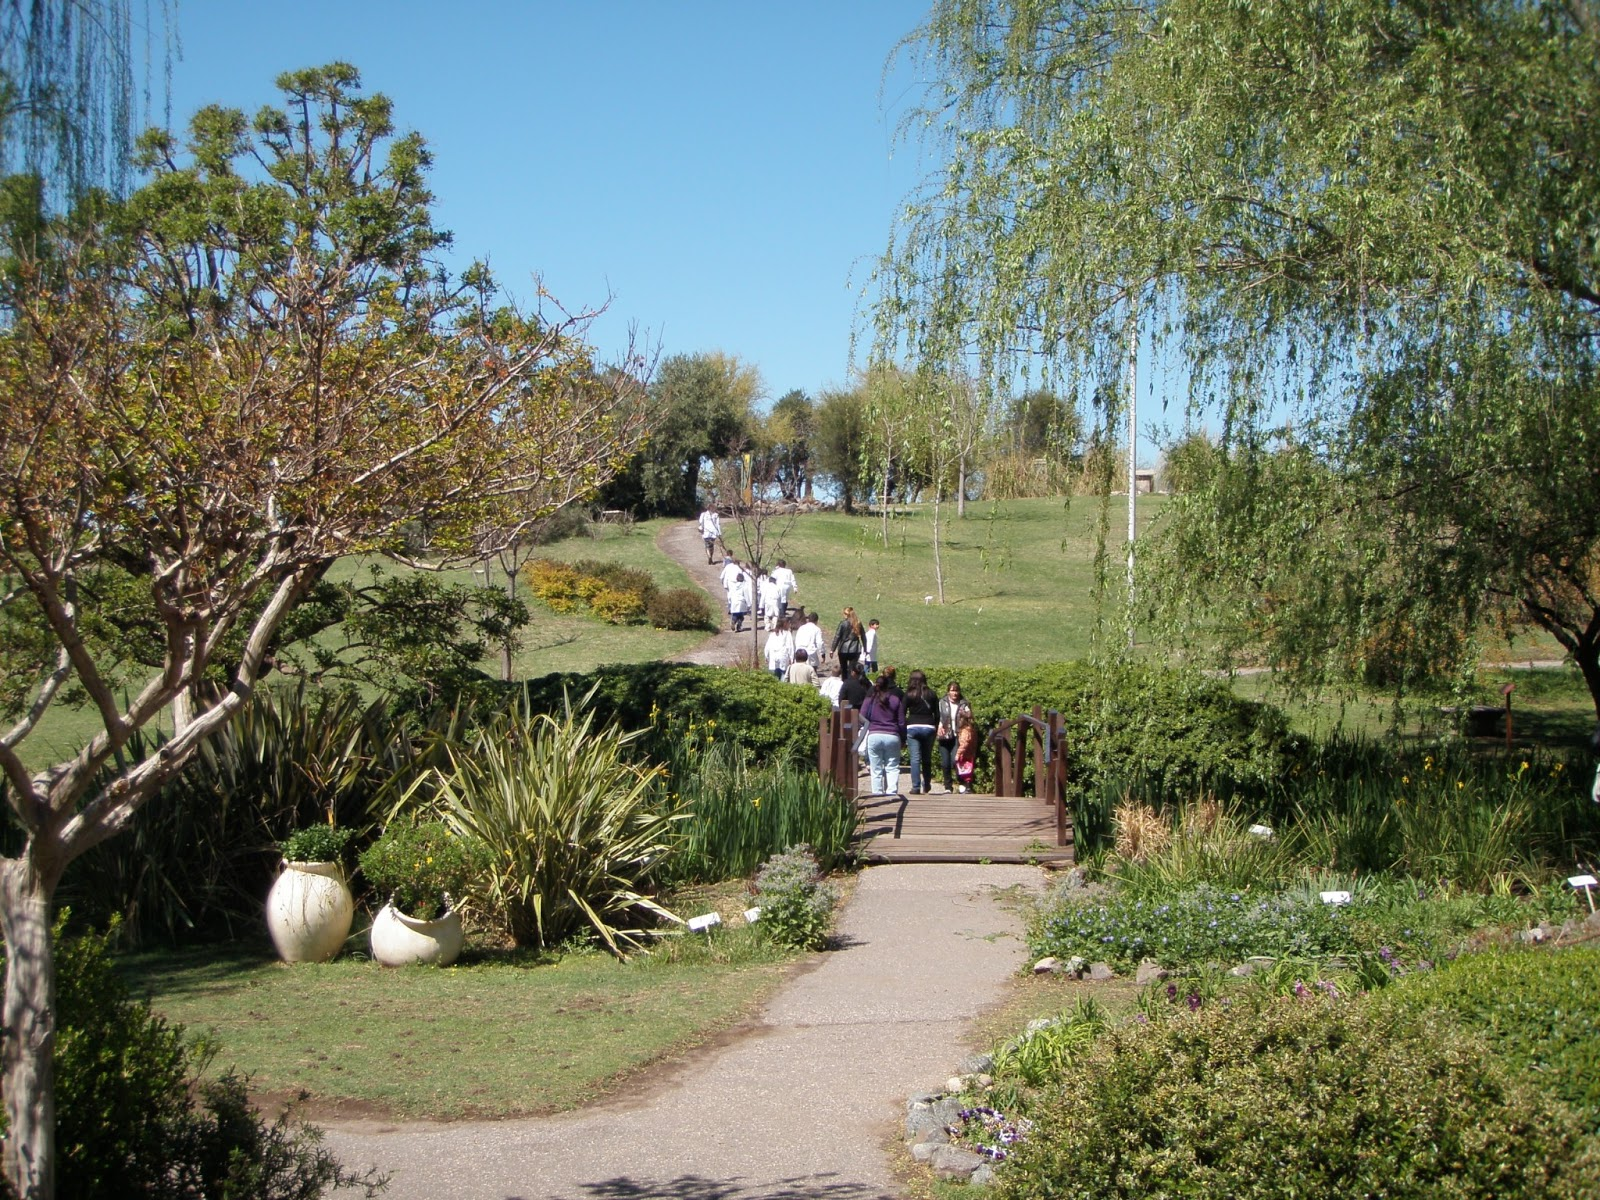 Jard n bot nico de c rdoba en abril capacitaci n docente for Jardin botanico cursos